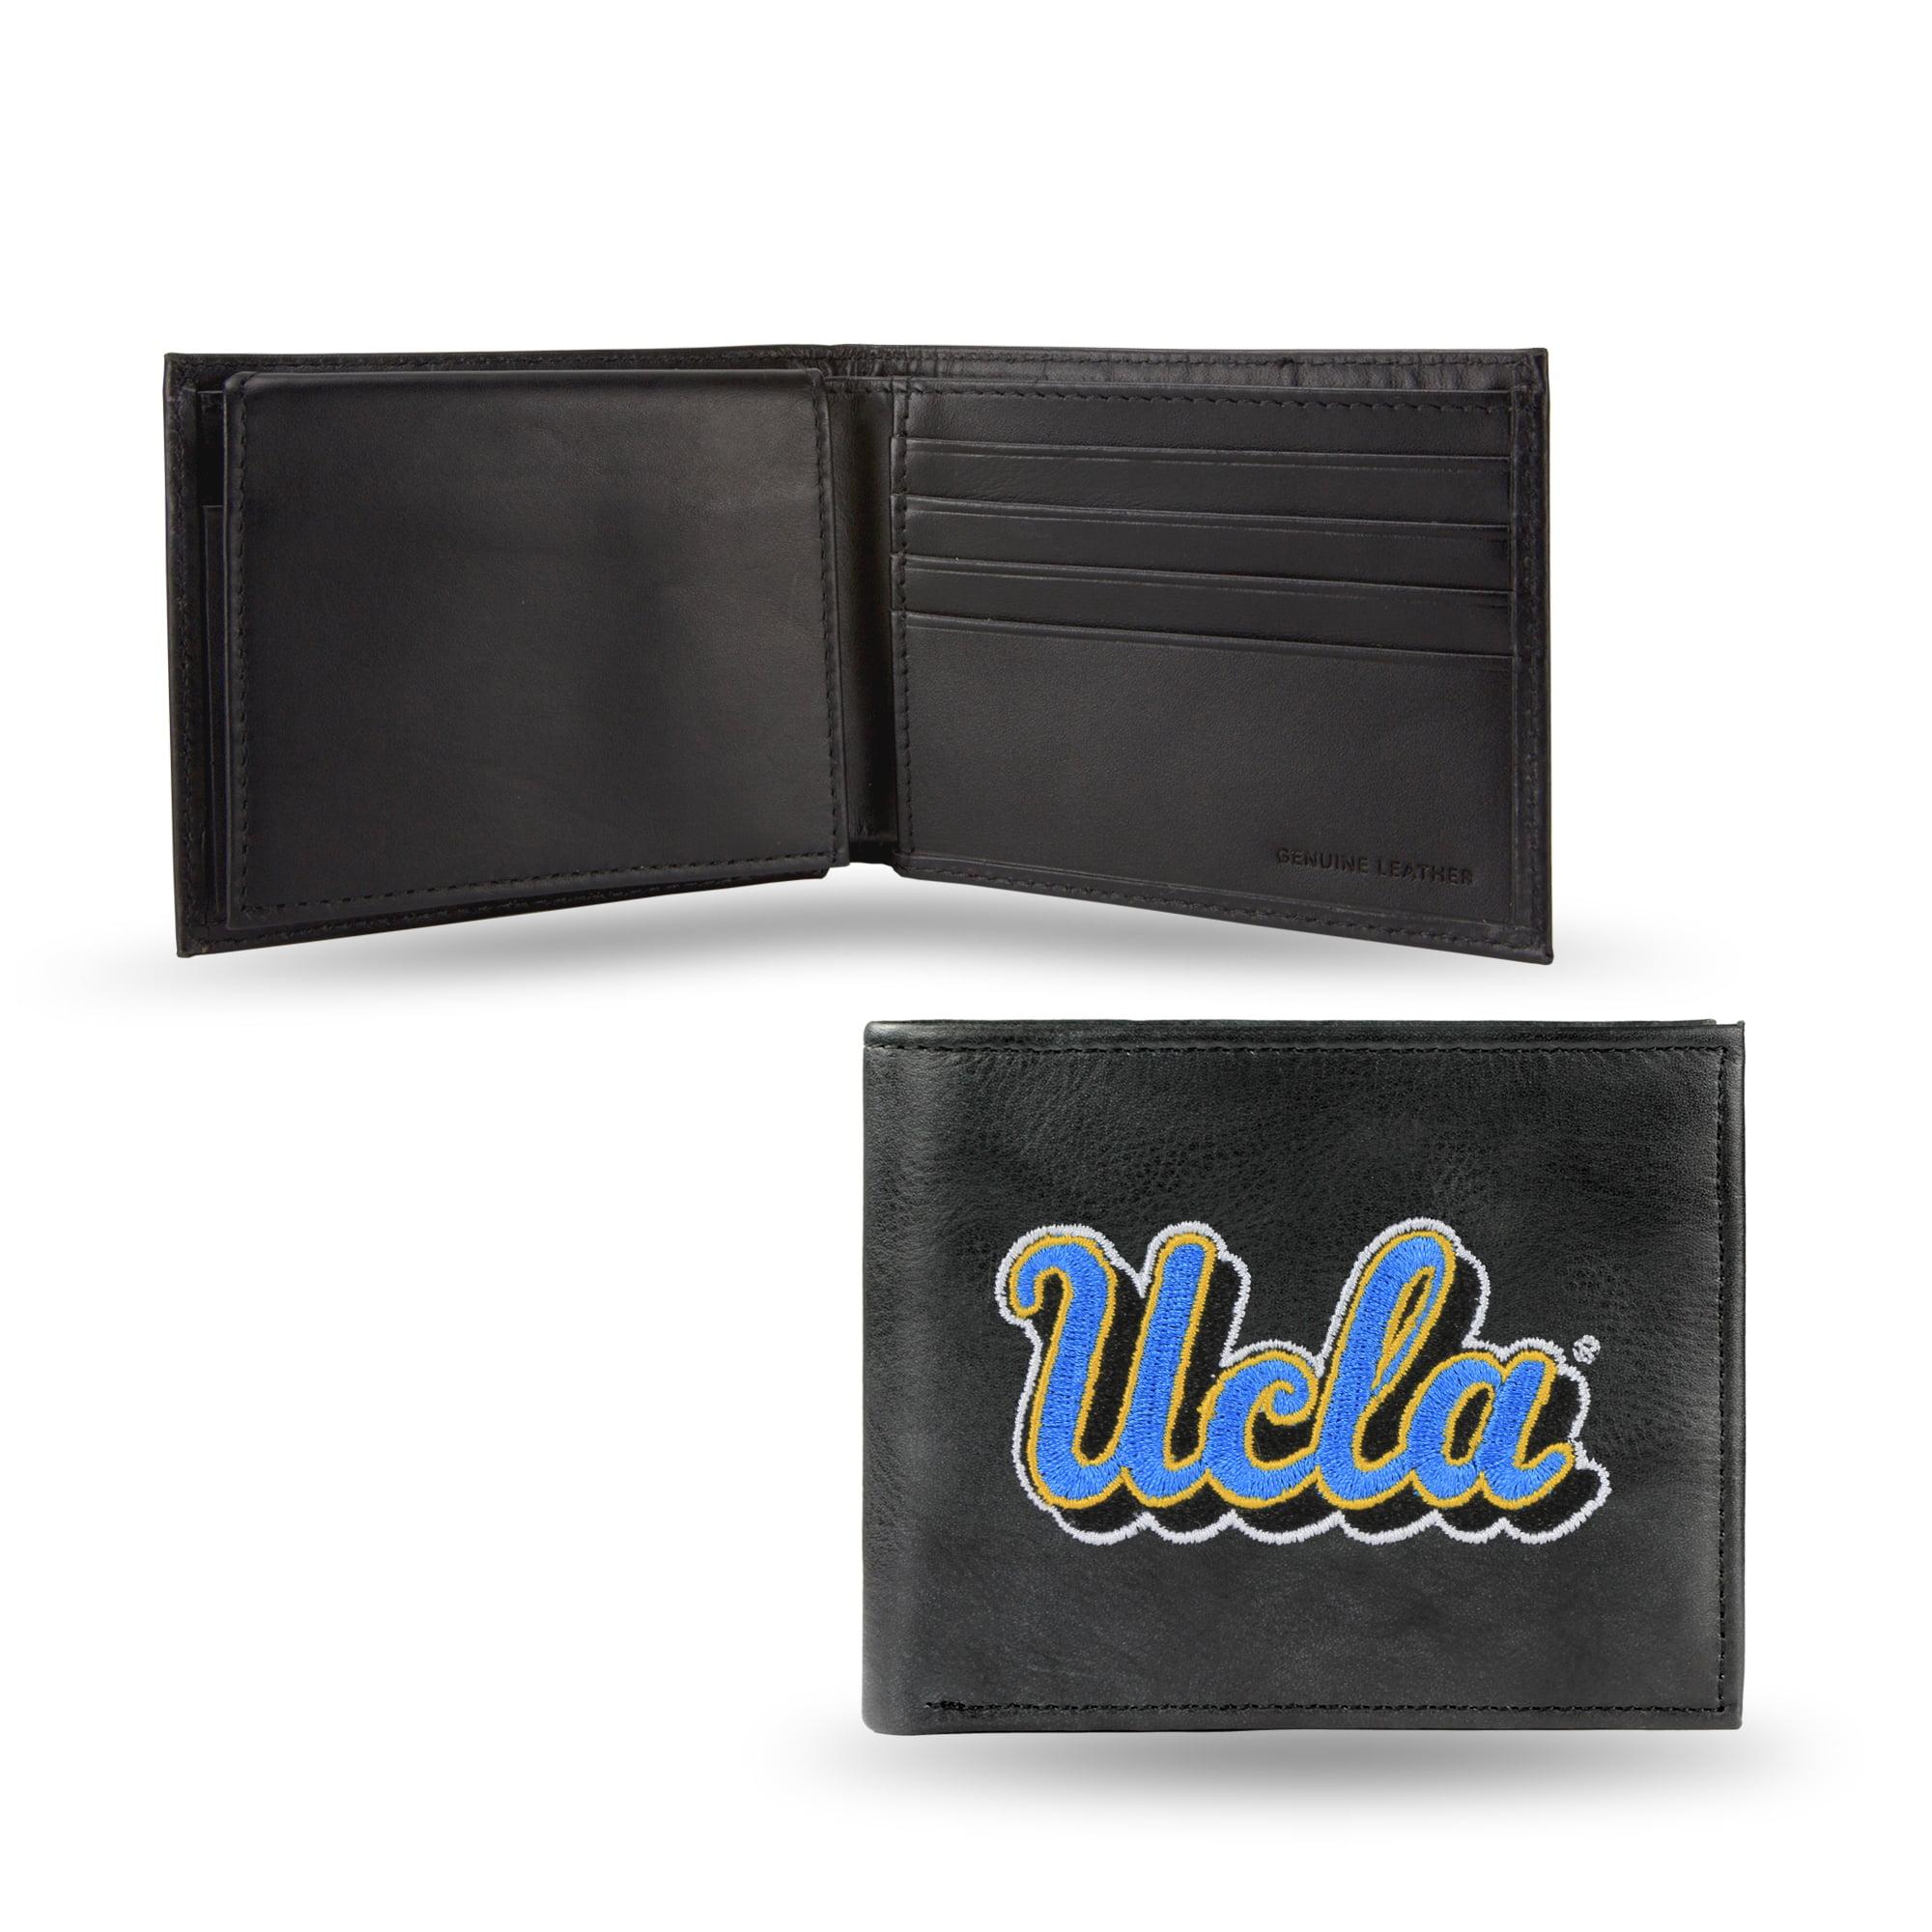 NCAA - Men's UCLA Bruins Embroidered Billfold Wallet